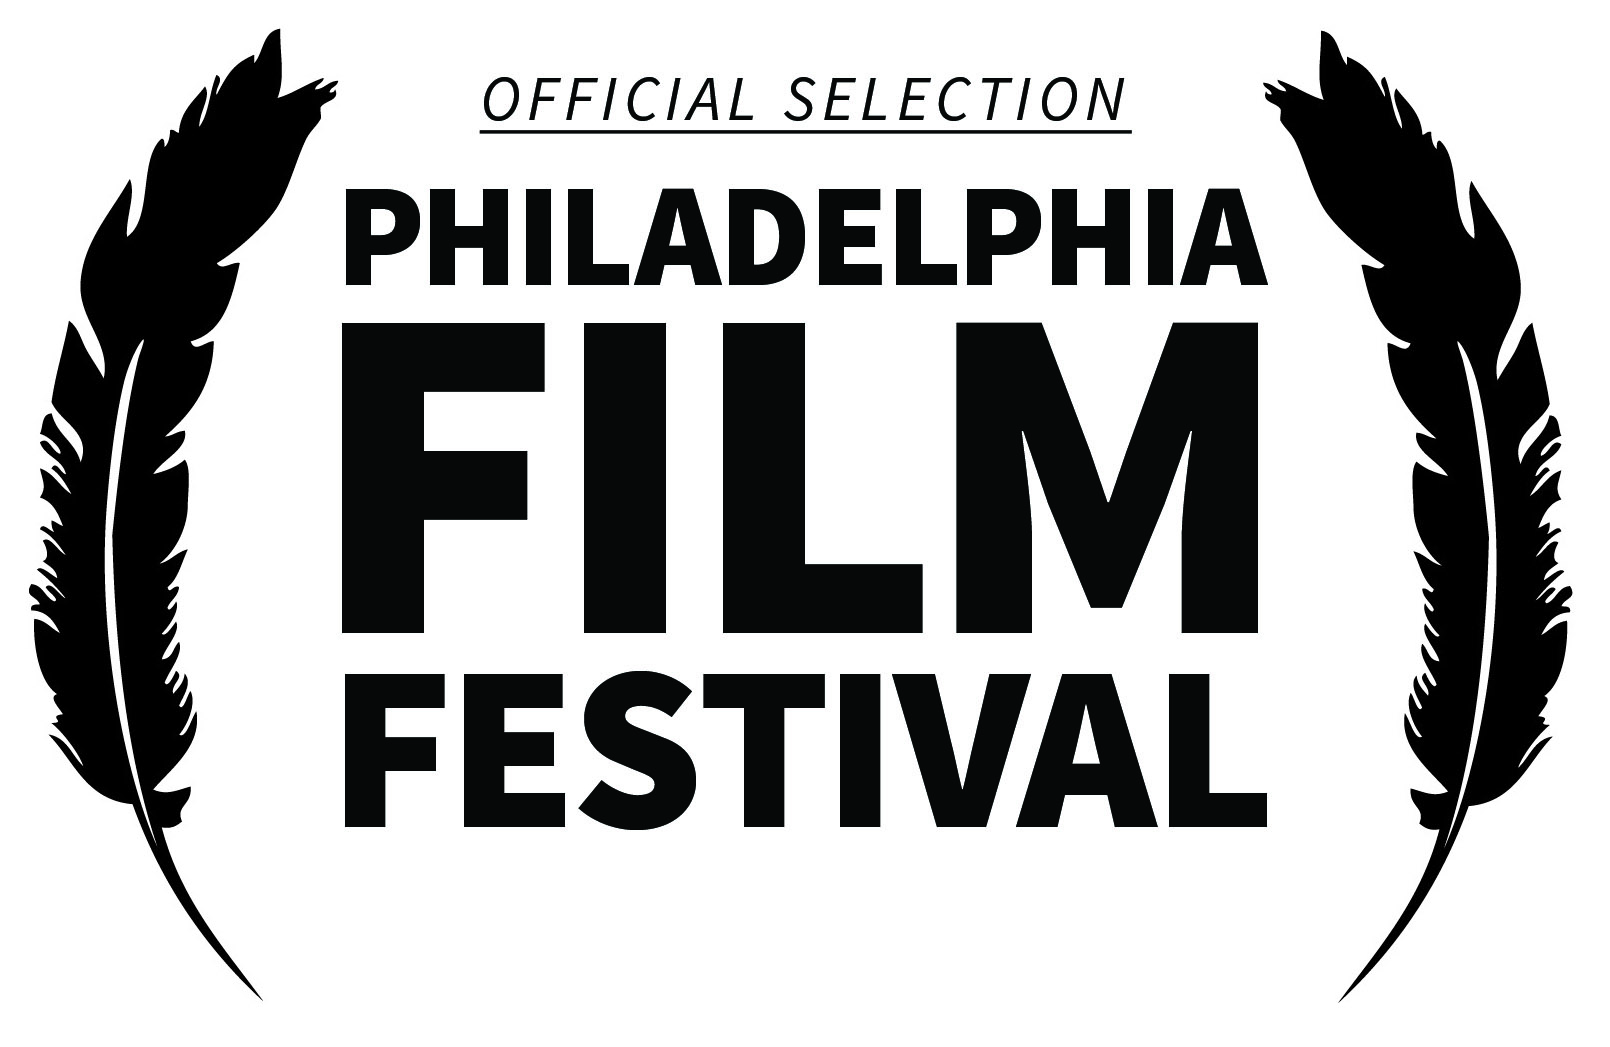 PhiladelphiaFF- OS.jpg